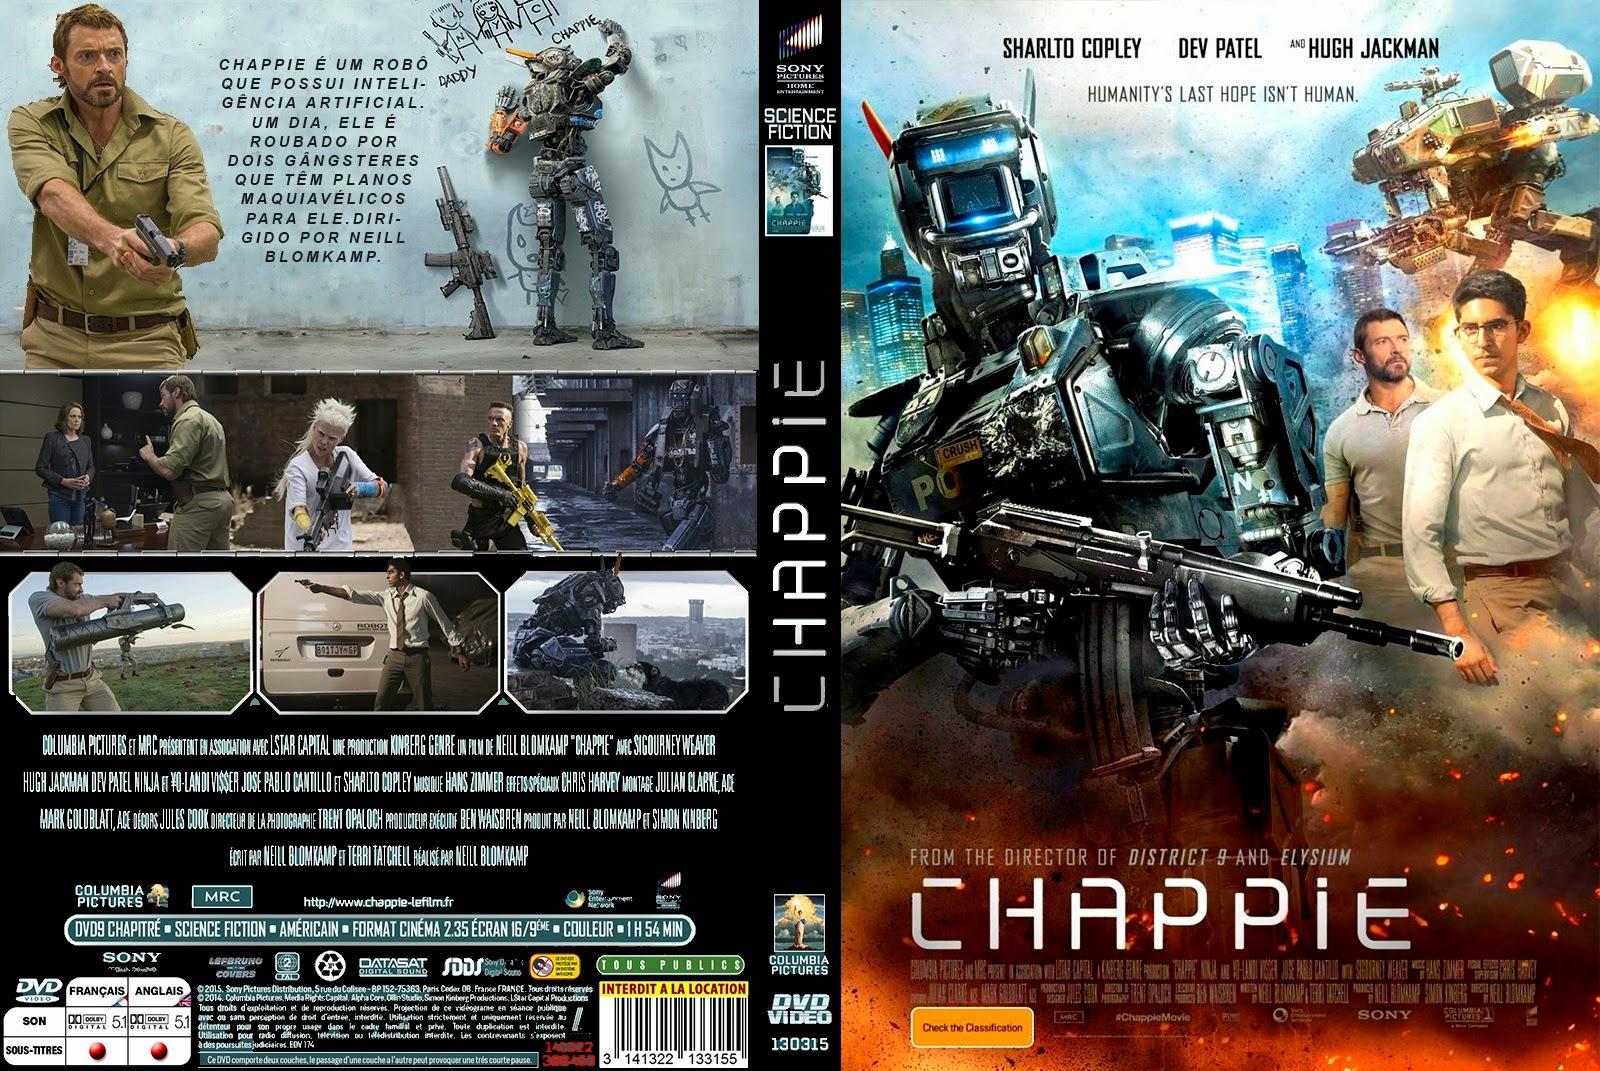 Baixar Chappie DVD-R Chappie 2Bcap 2B02